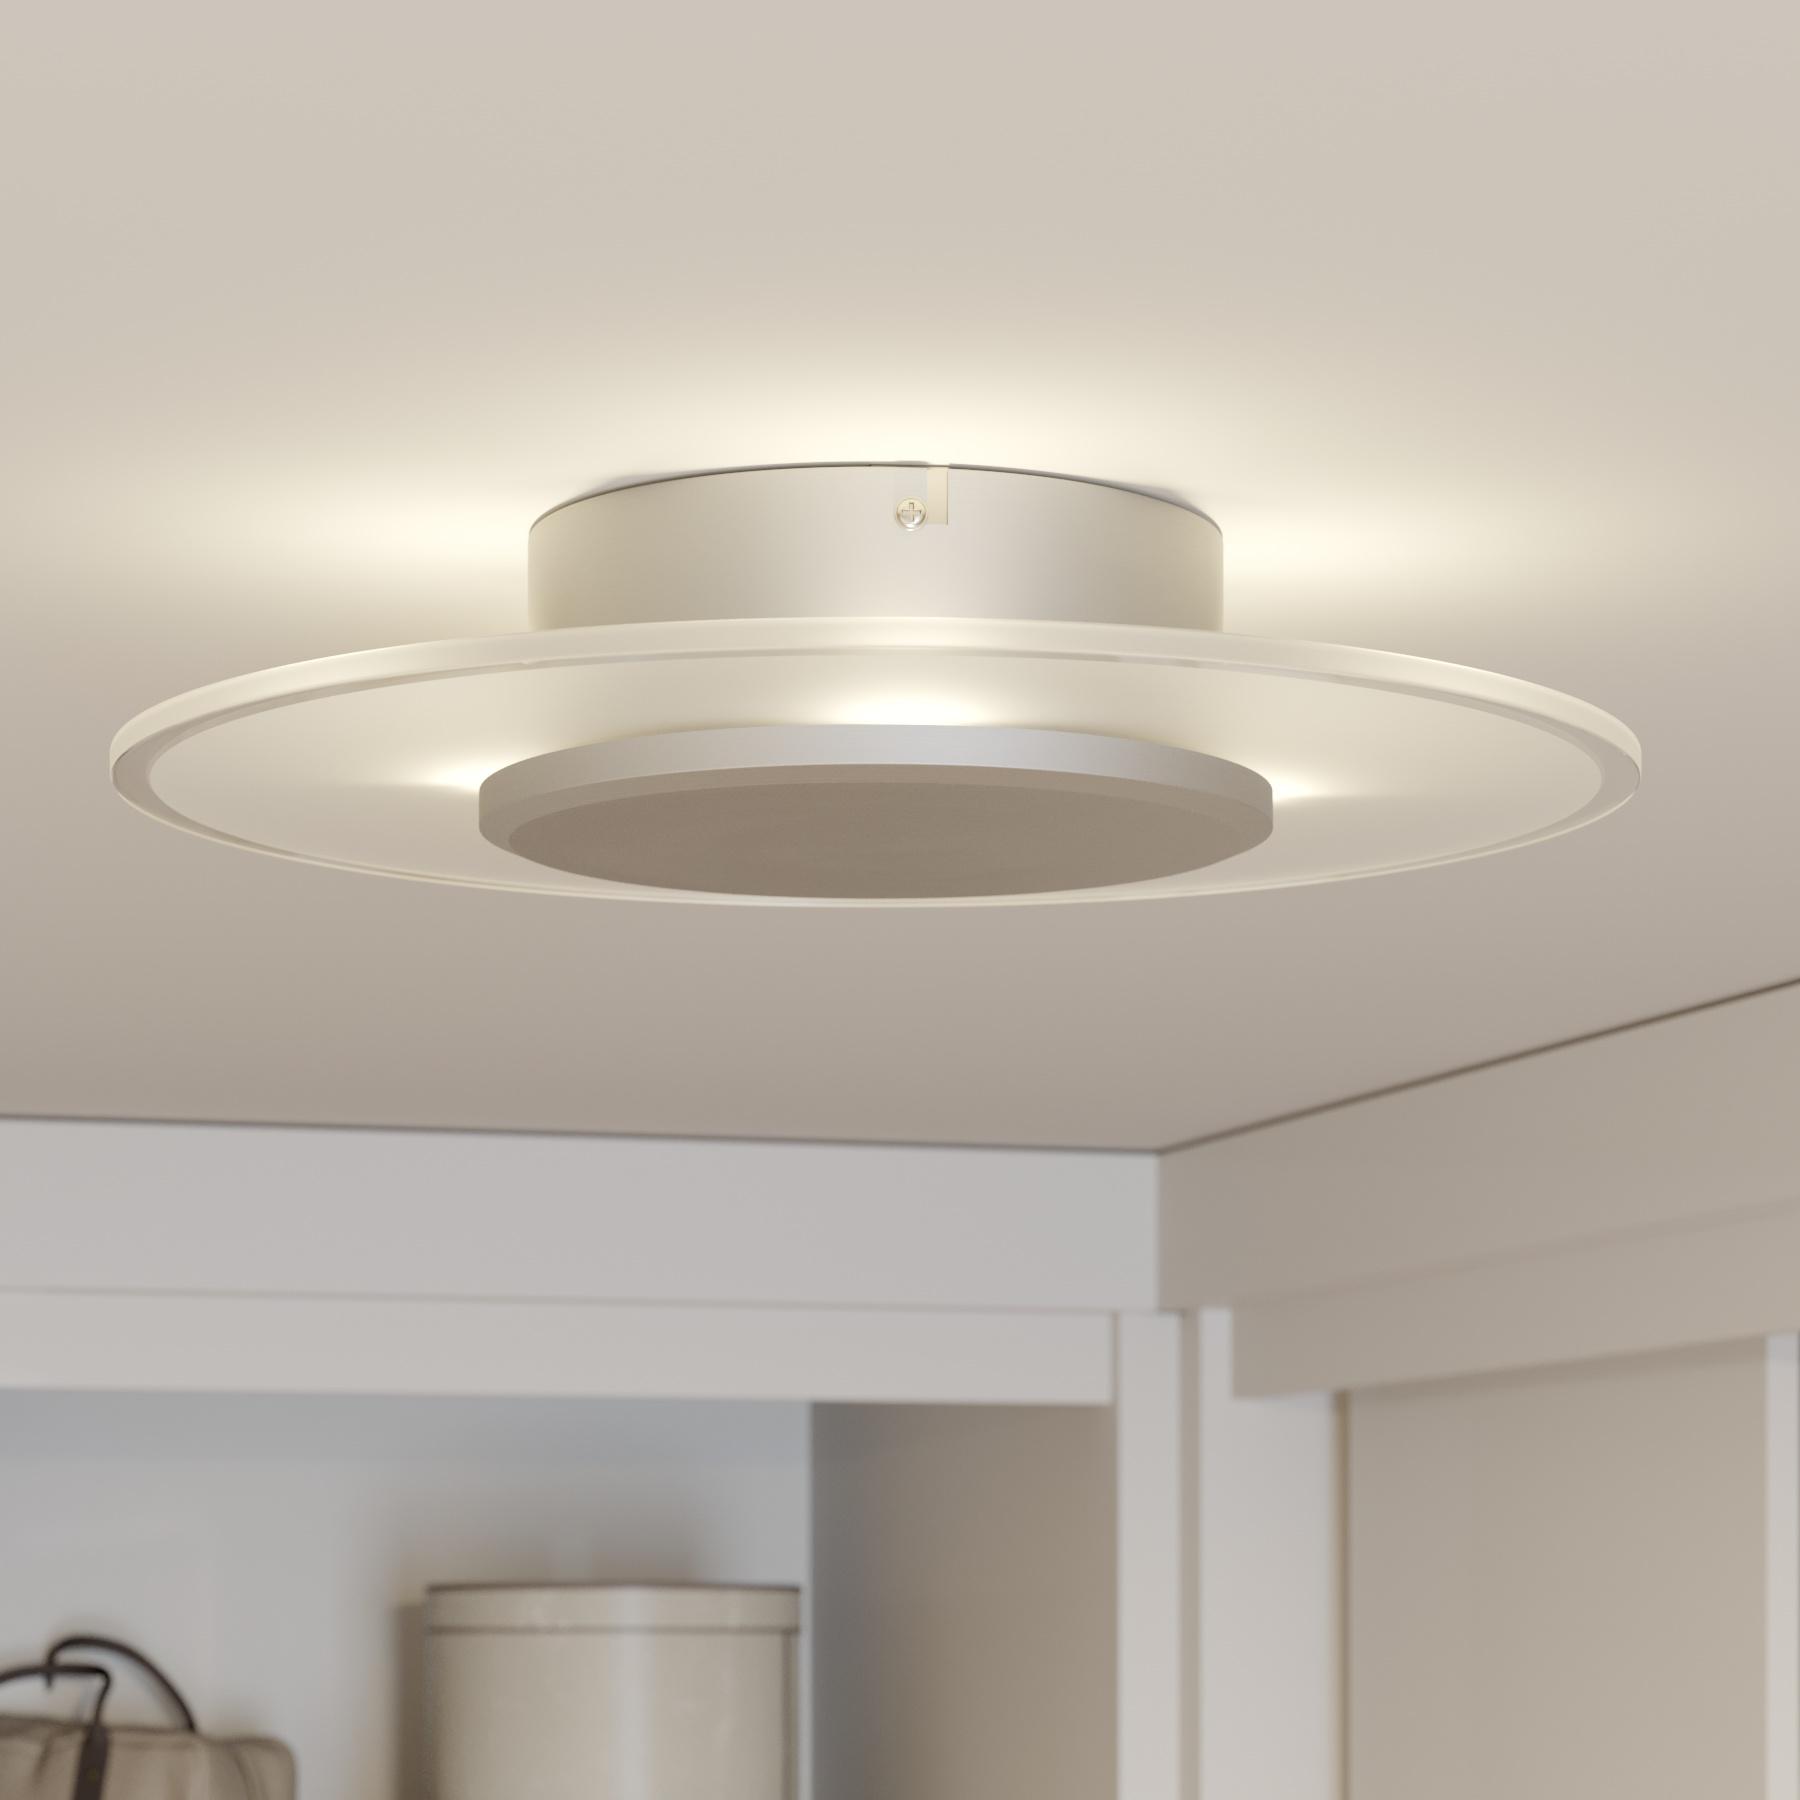 Perfect gevormde LED-plafondlamp Lena, dimbaar